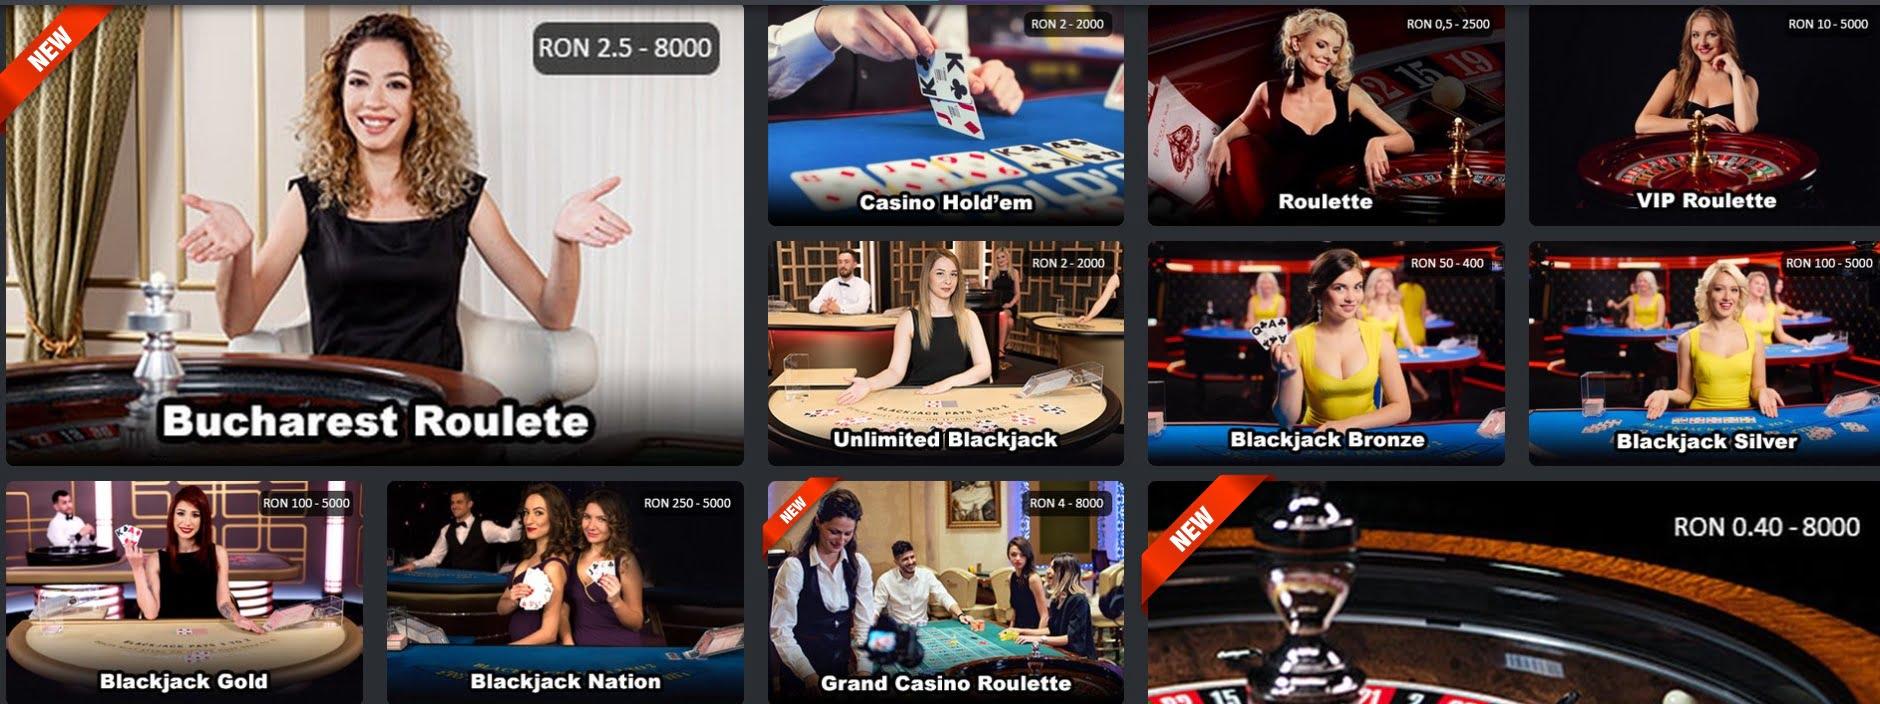 Winbet Casino Dealeri Reali